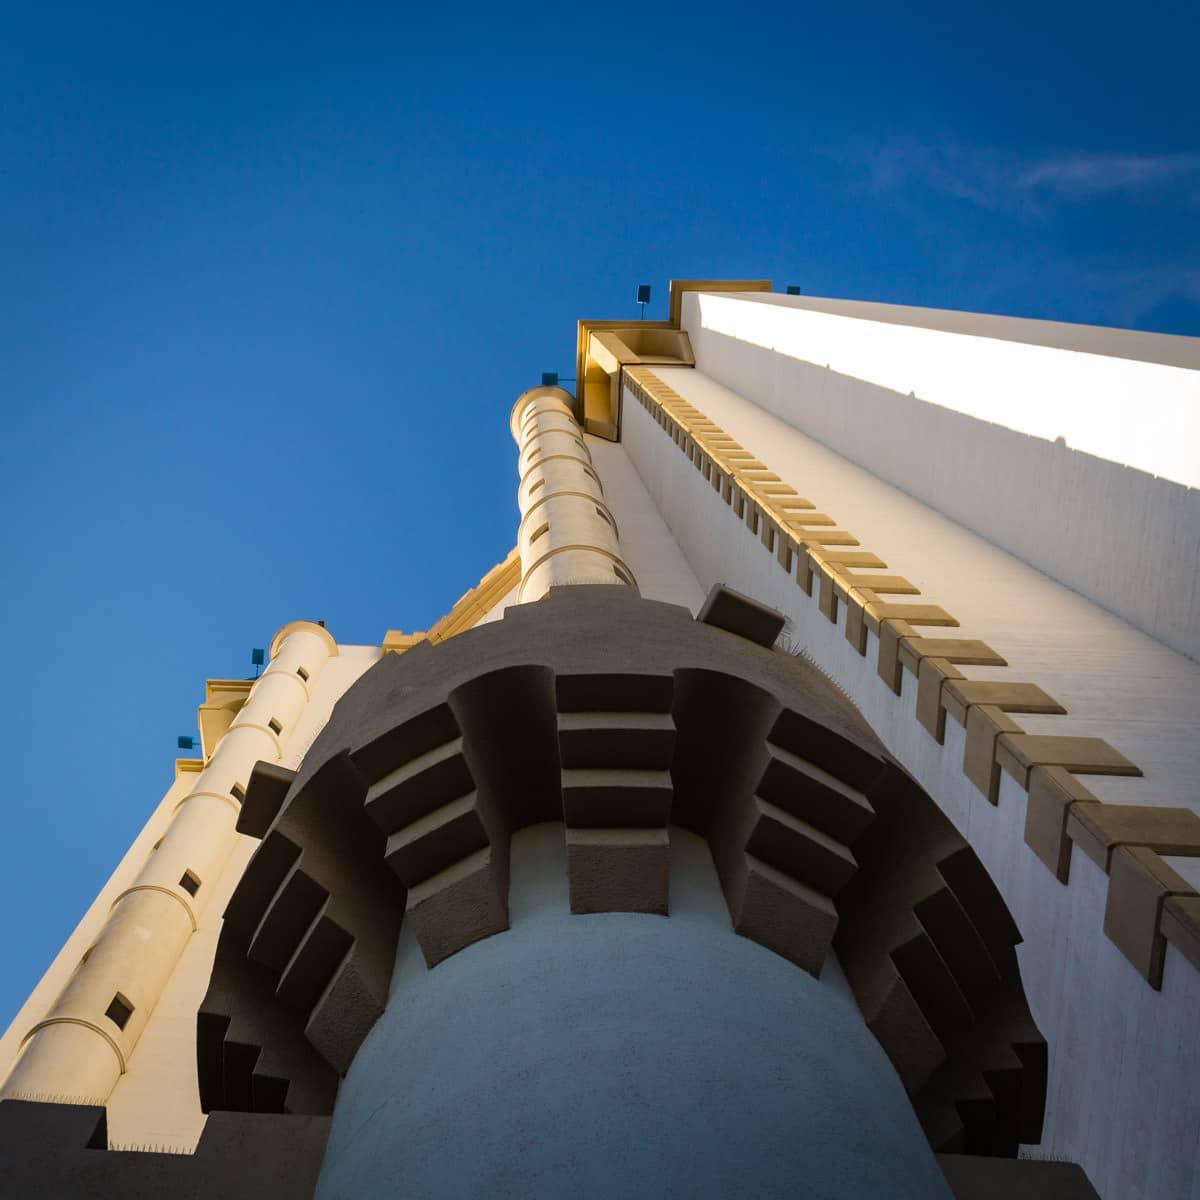 Exterior detail of the Excalibur Hotel and Casino, Las Vegas.